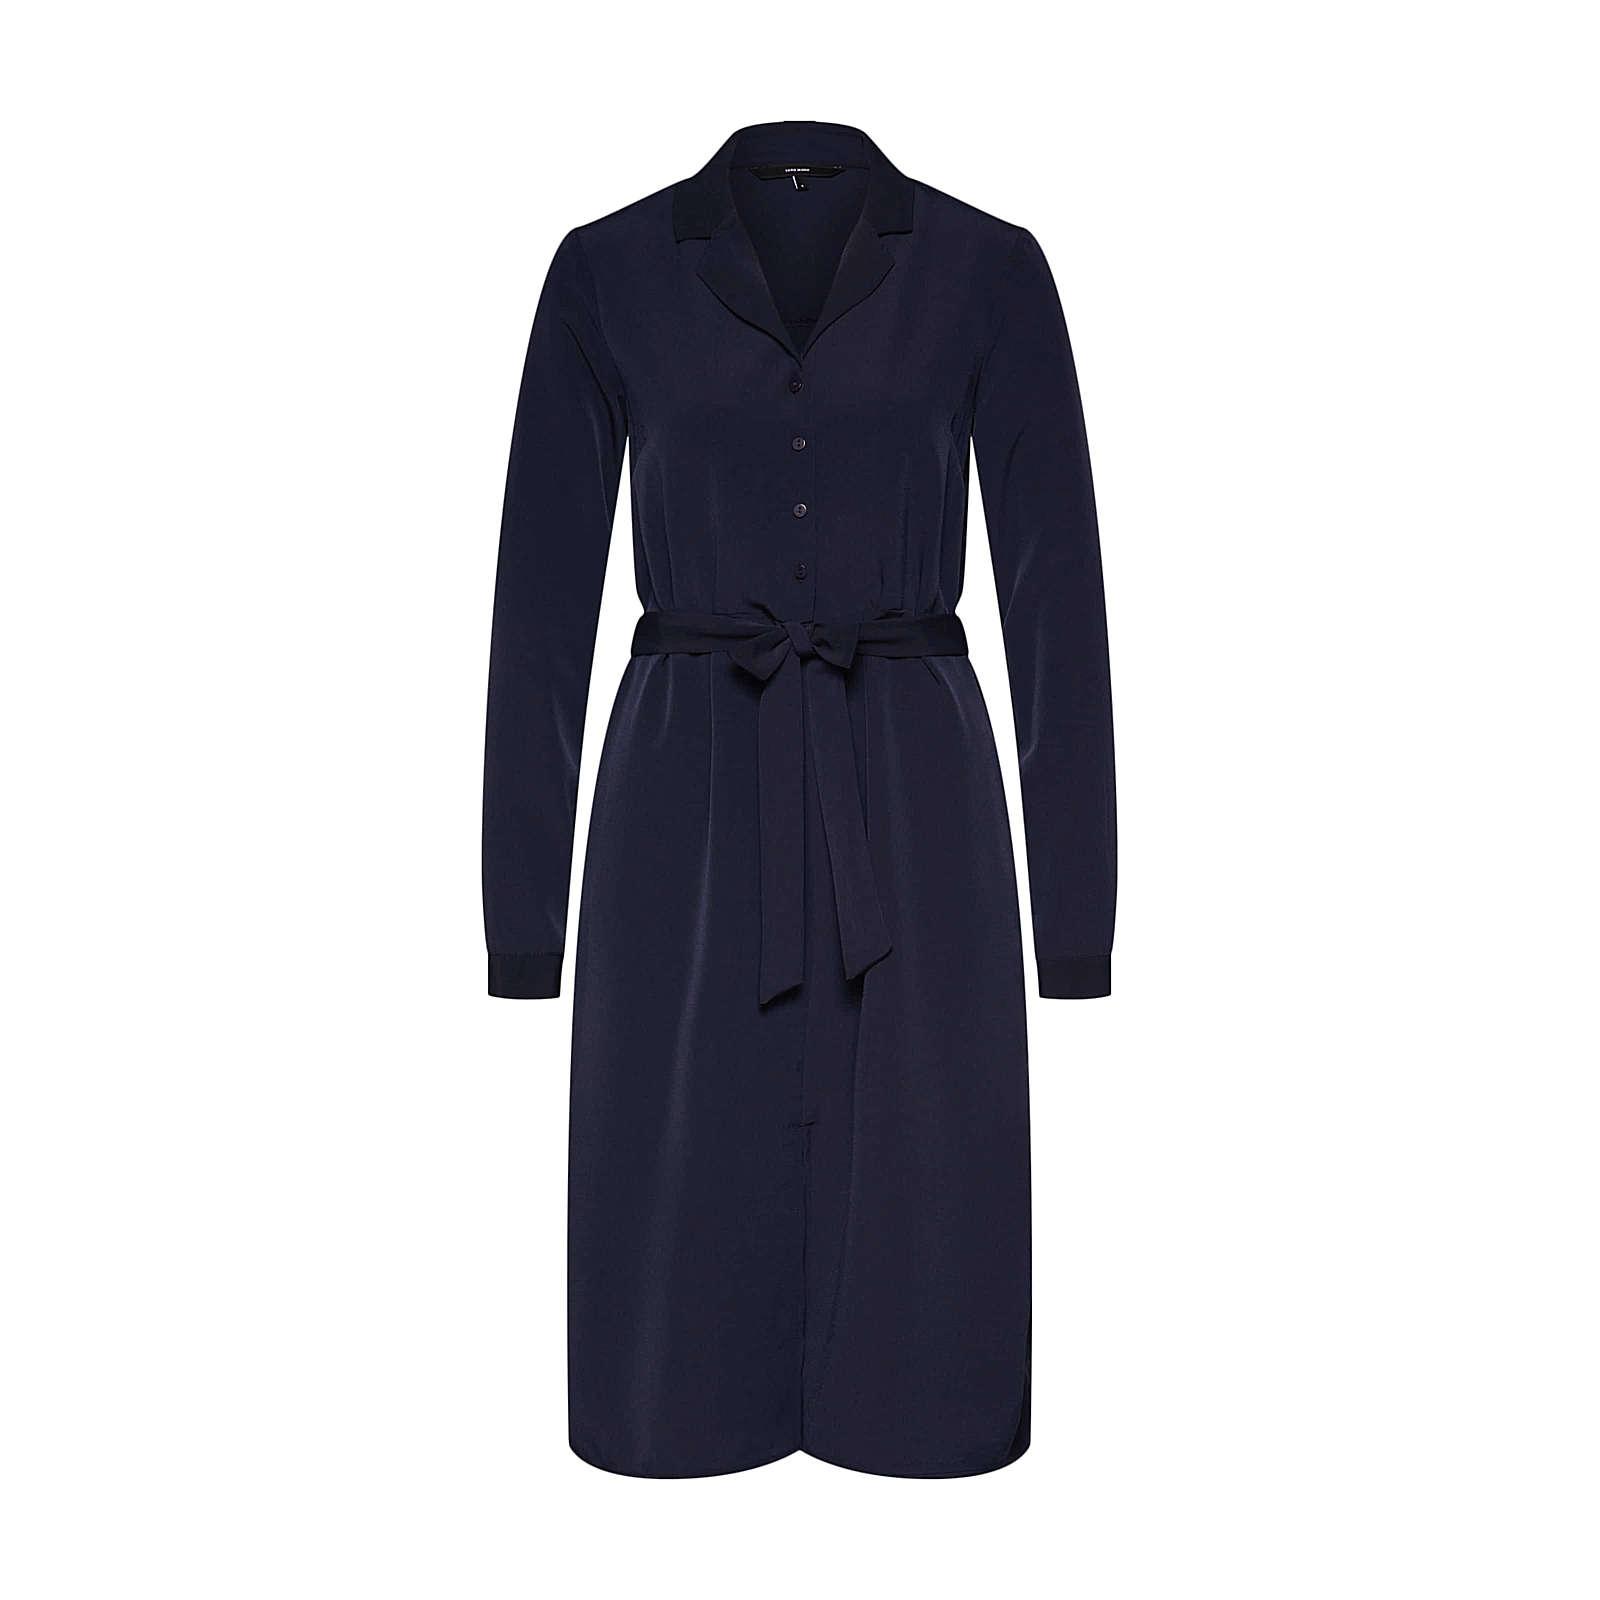 VERO MODA Blusenkleid CAMILA Blusenkleider blau Damen Gr. 34